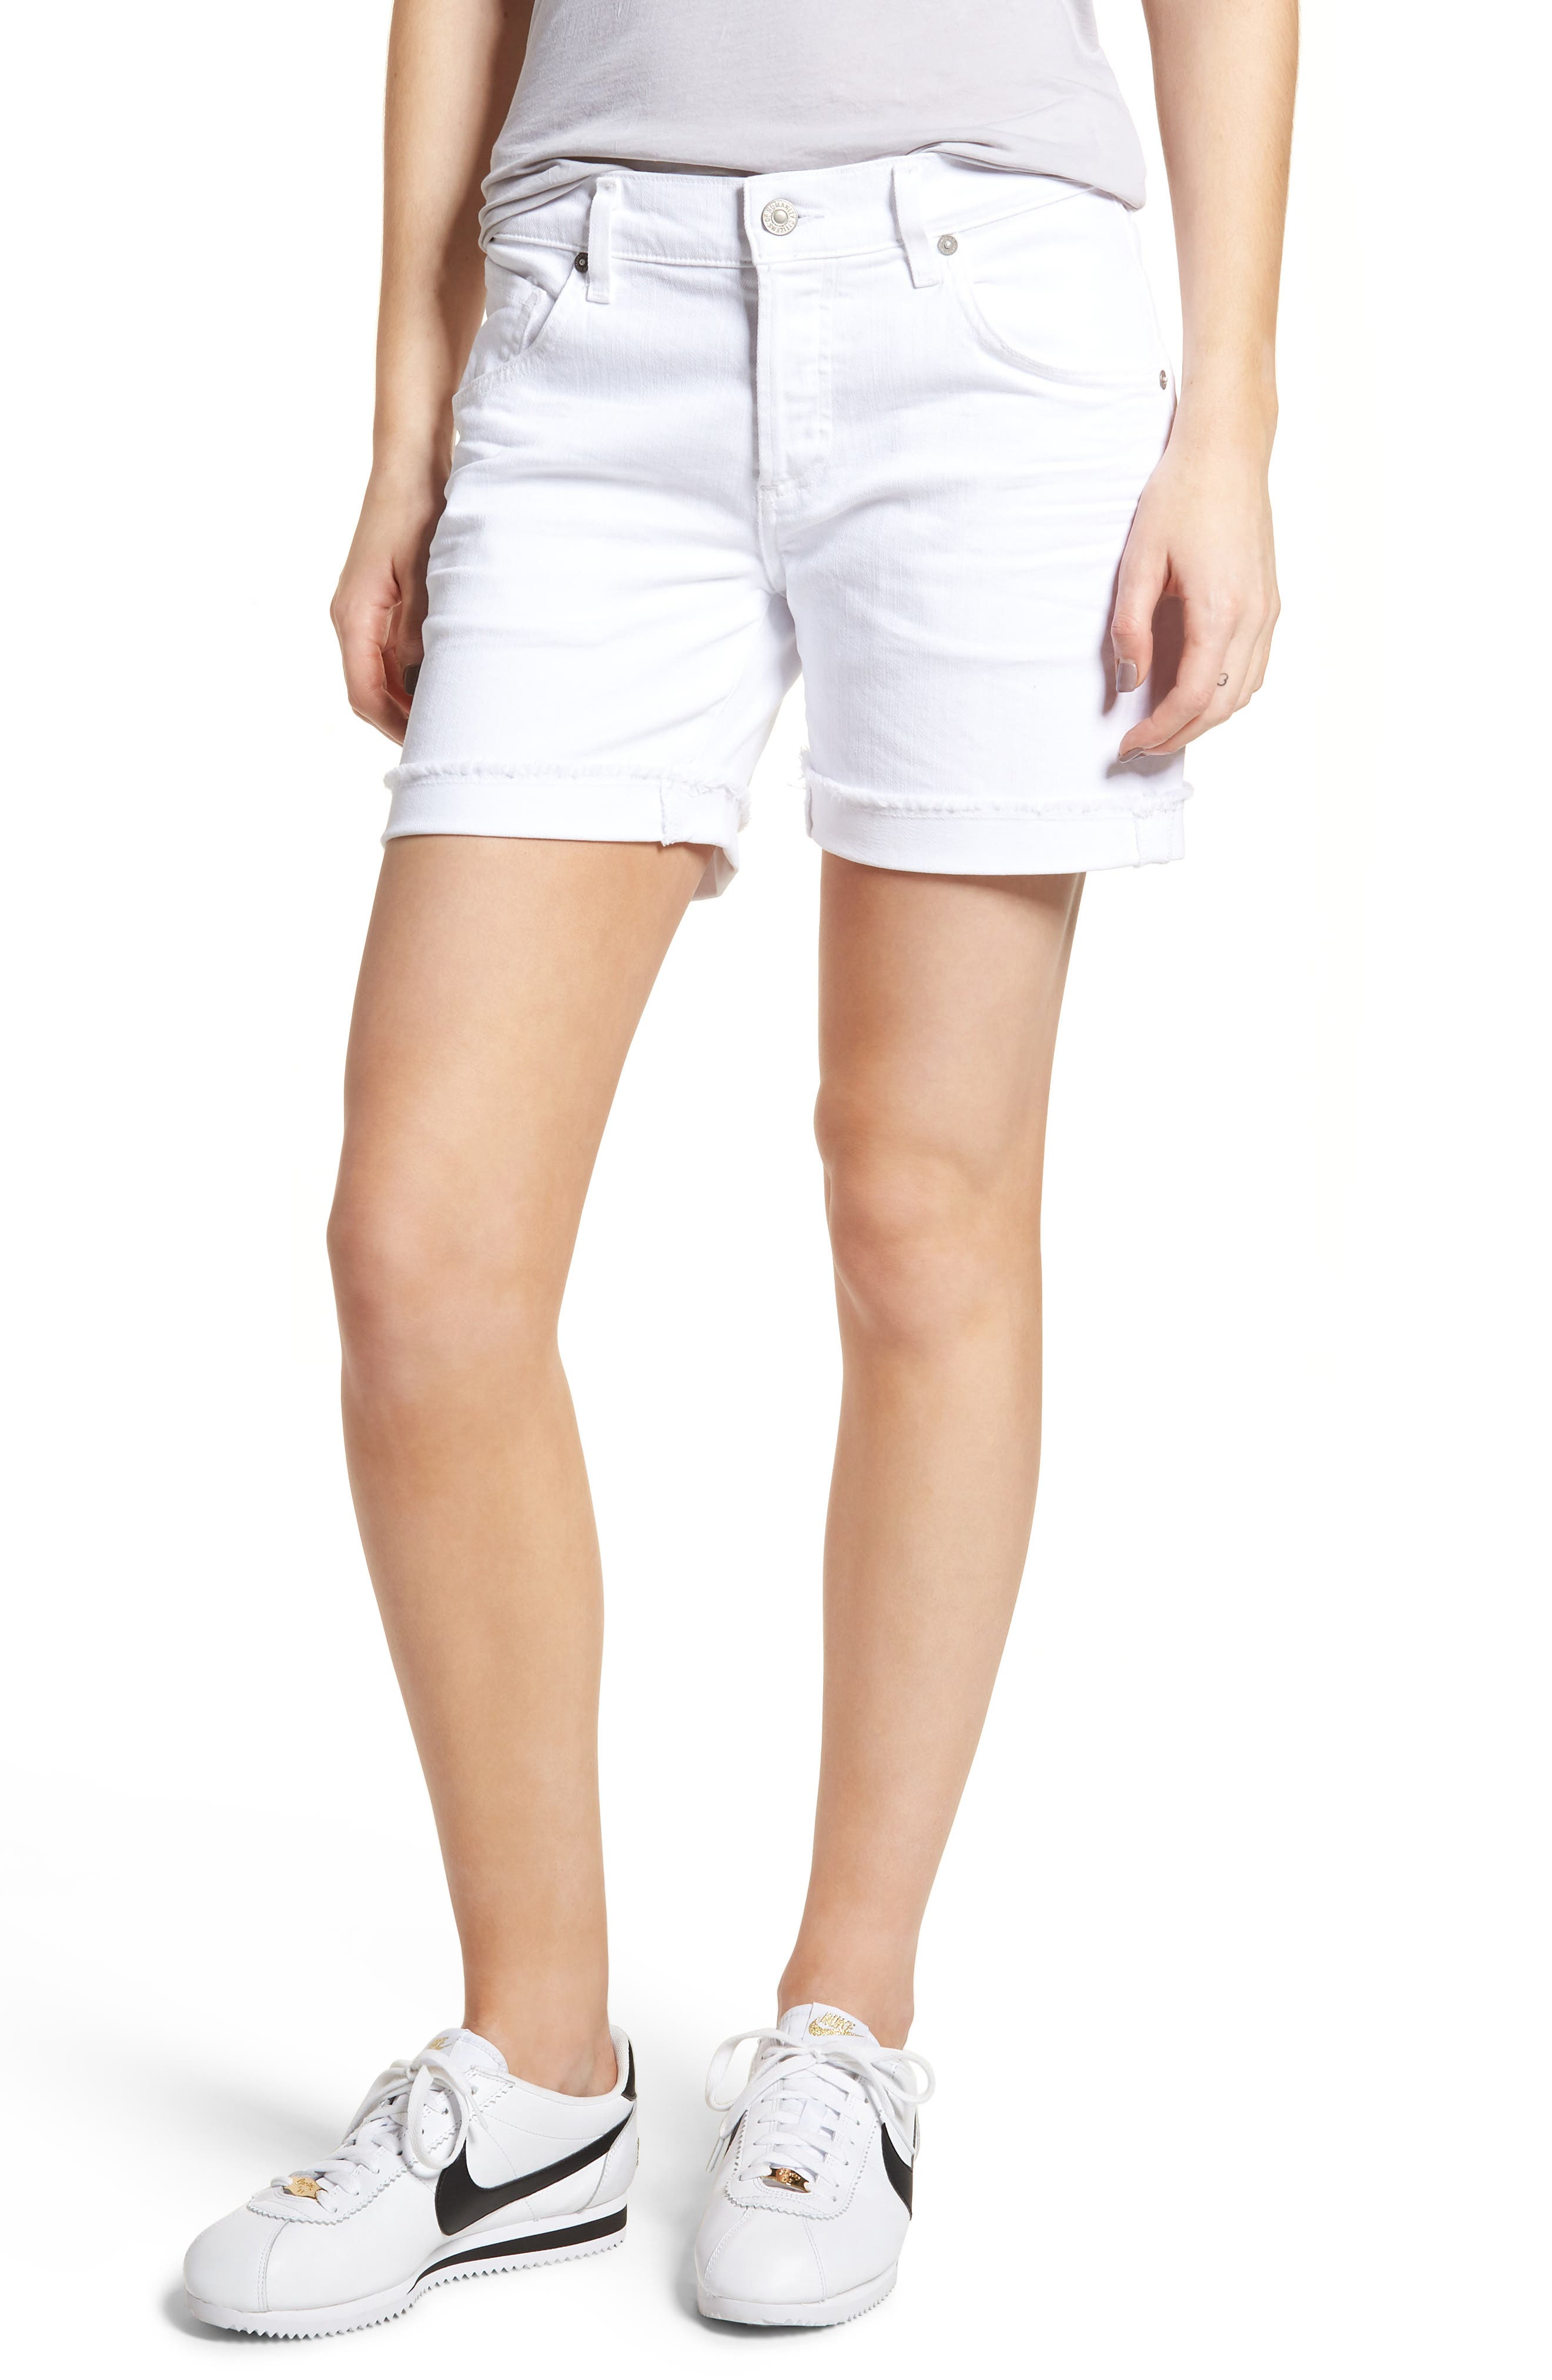 Skyler Denim Shorts,                             Main thumbnail 1, color,                             OPTIC WHITE